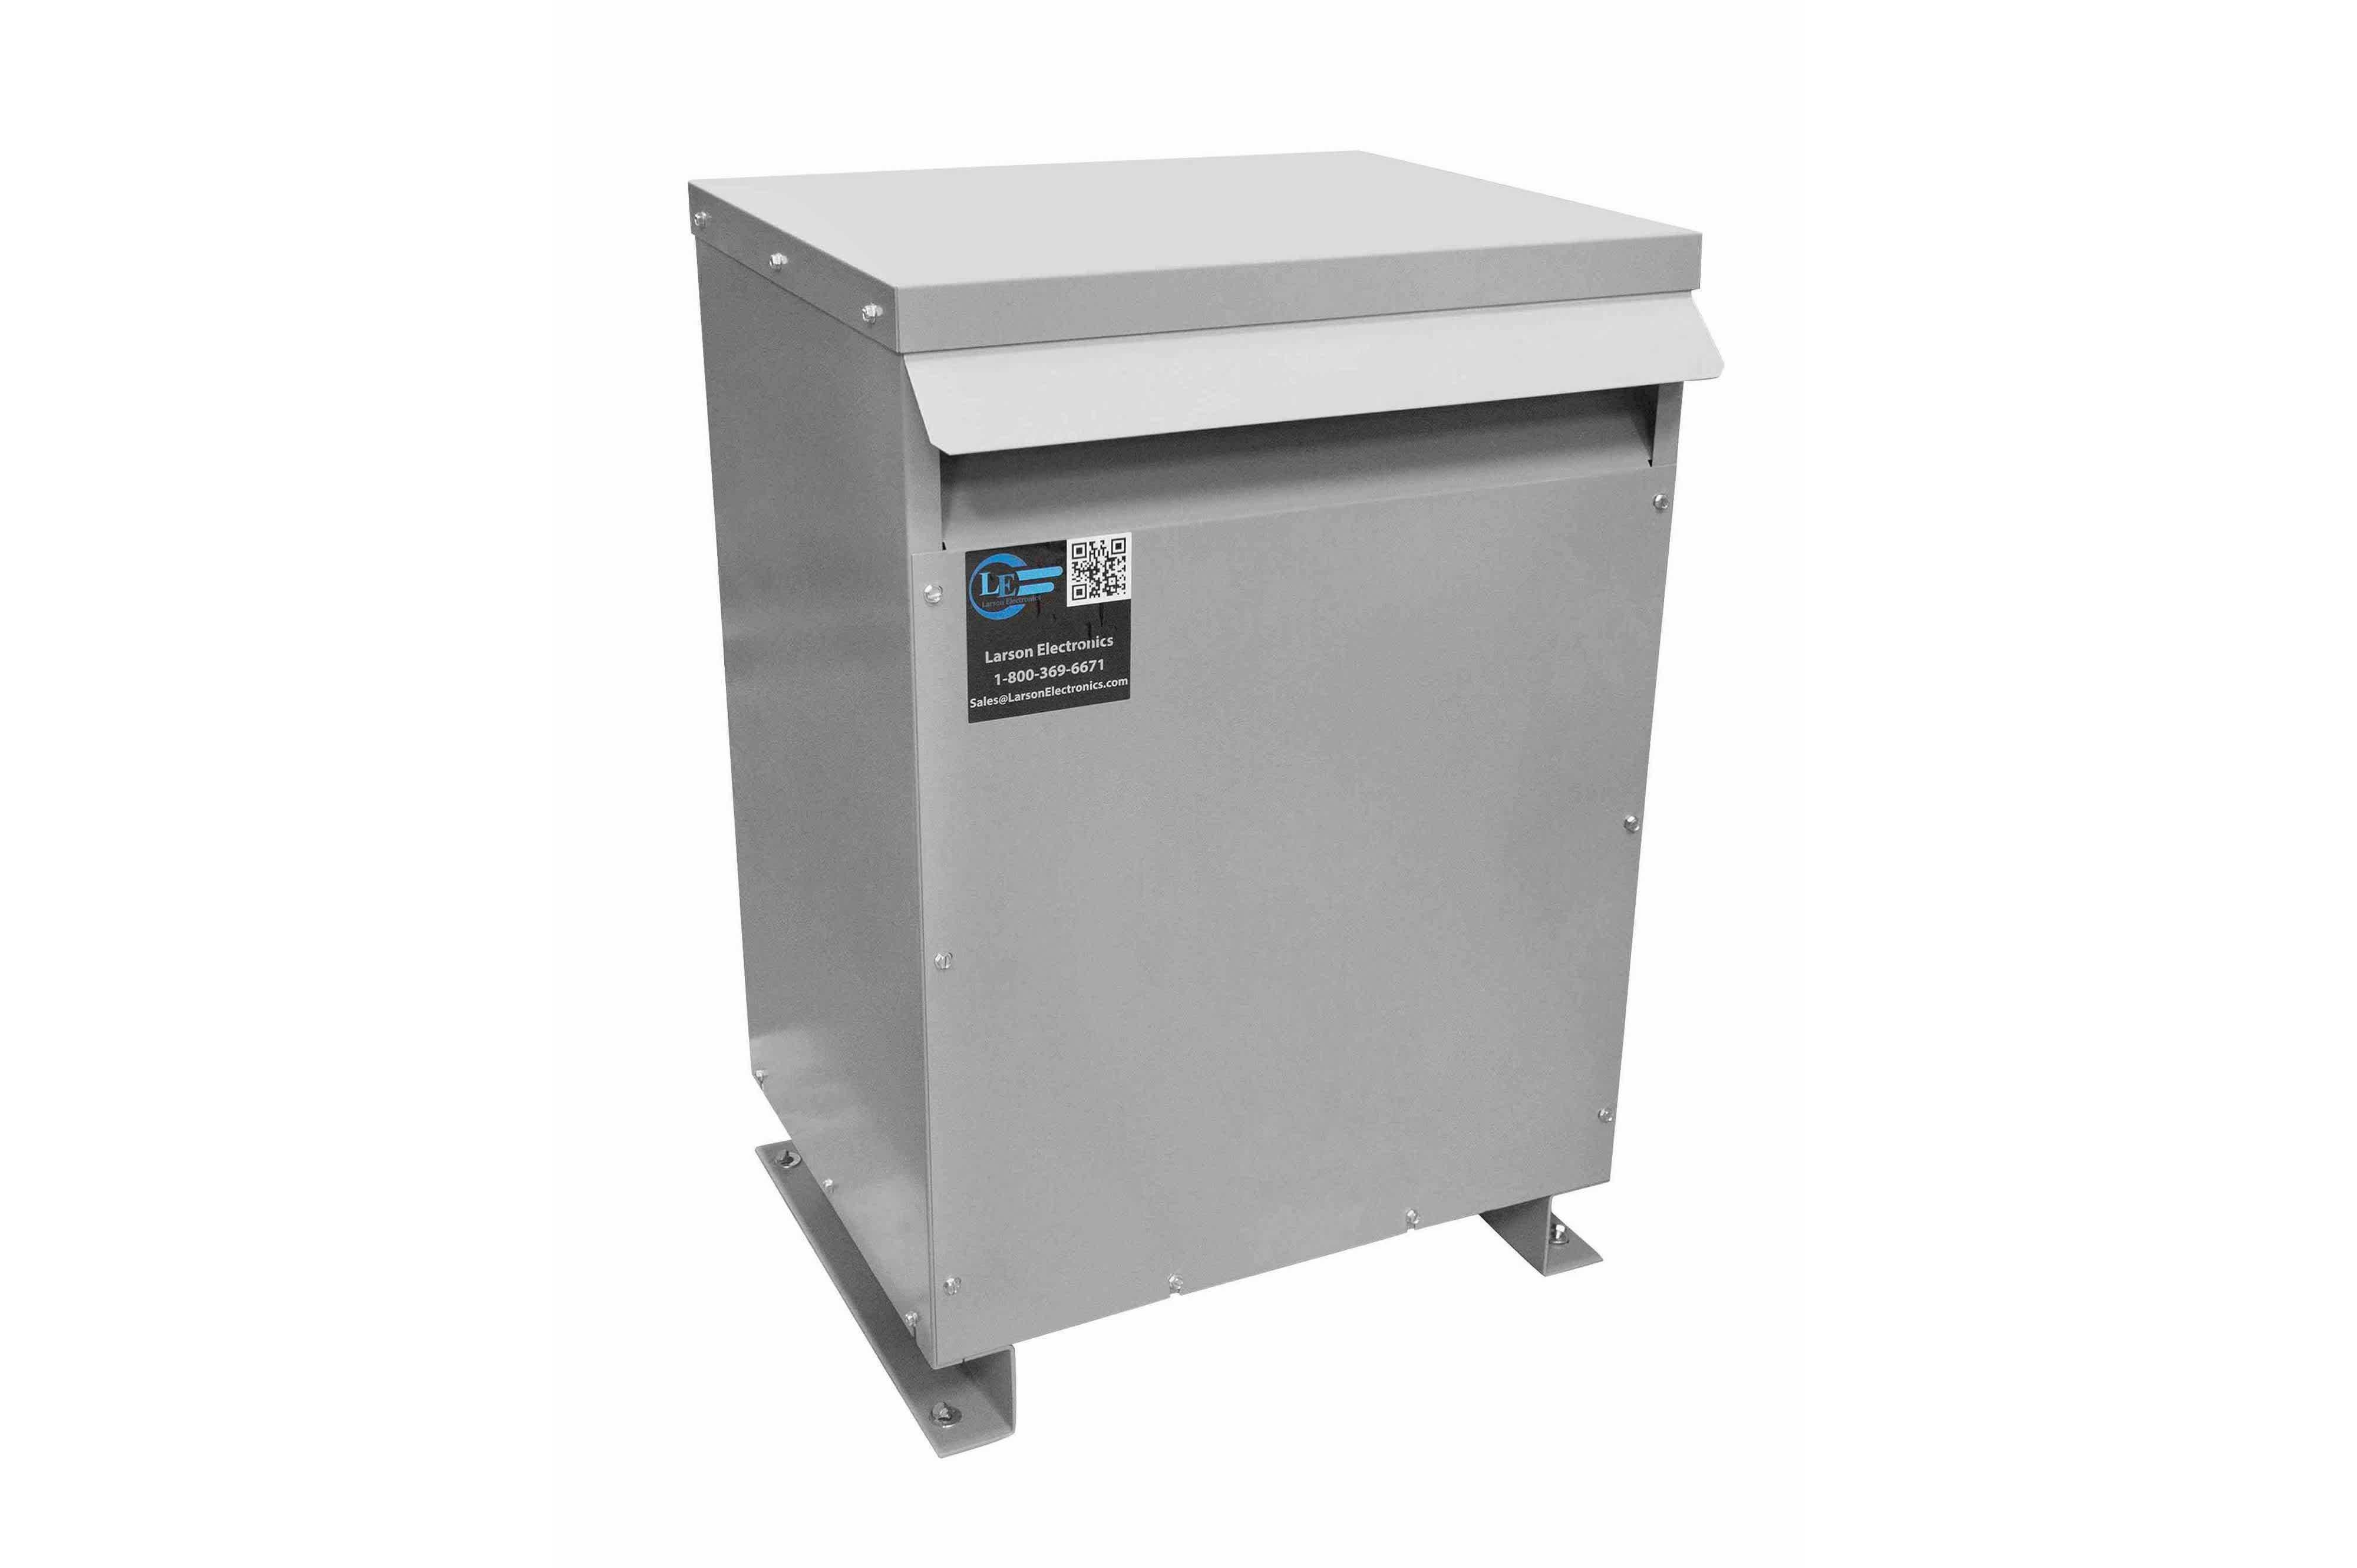 237.5 kVA 3PH Isolation Transformer, 220V Wye Primary, 208V Delta Secondary, N3R, Ventilated, 60 Hz